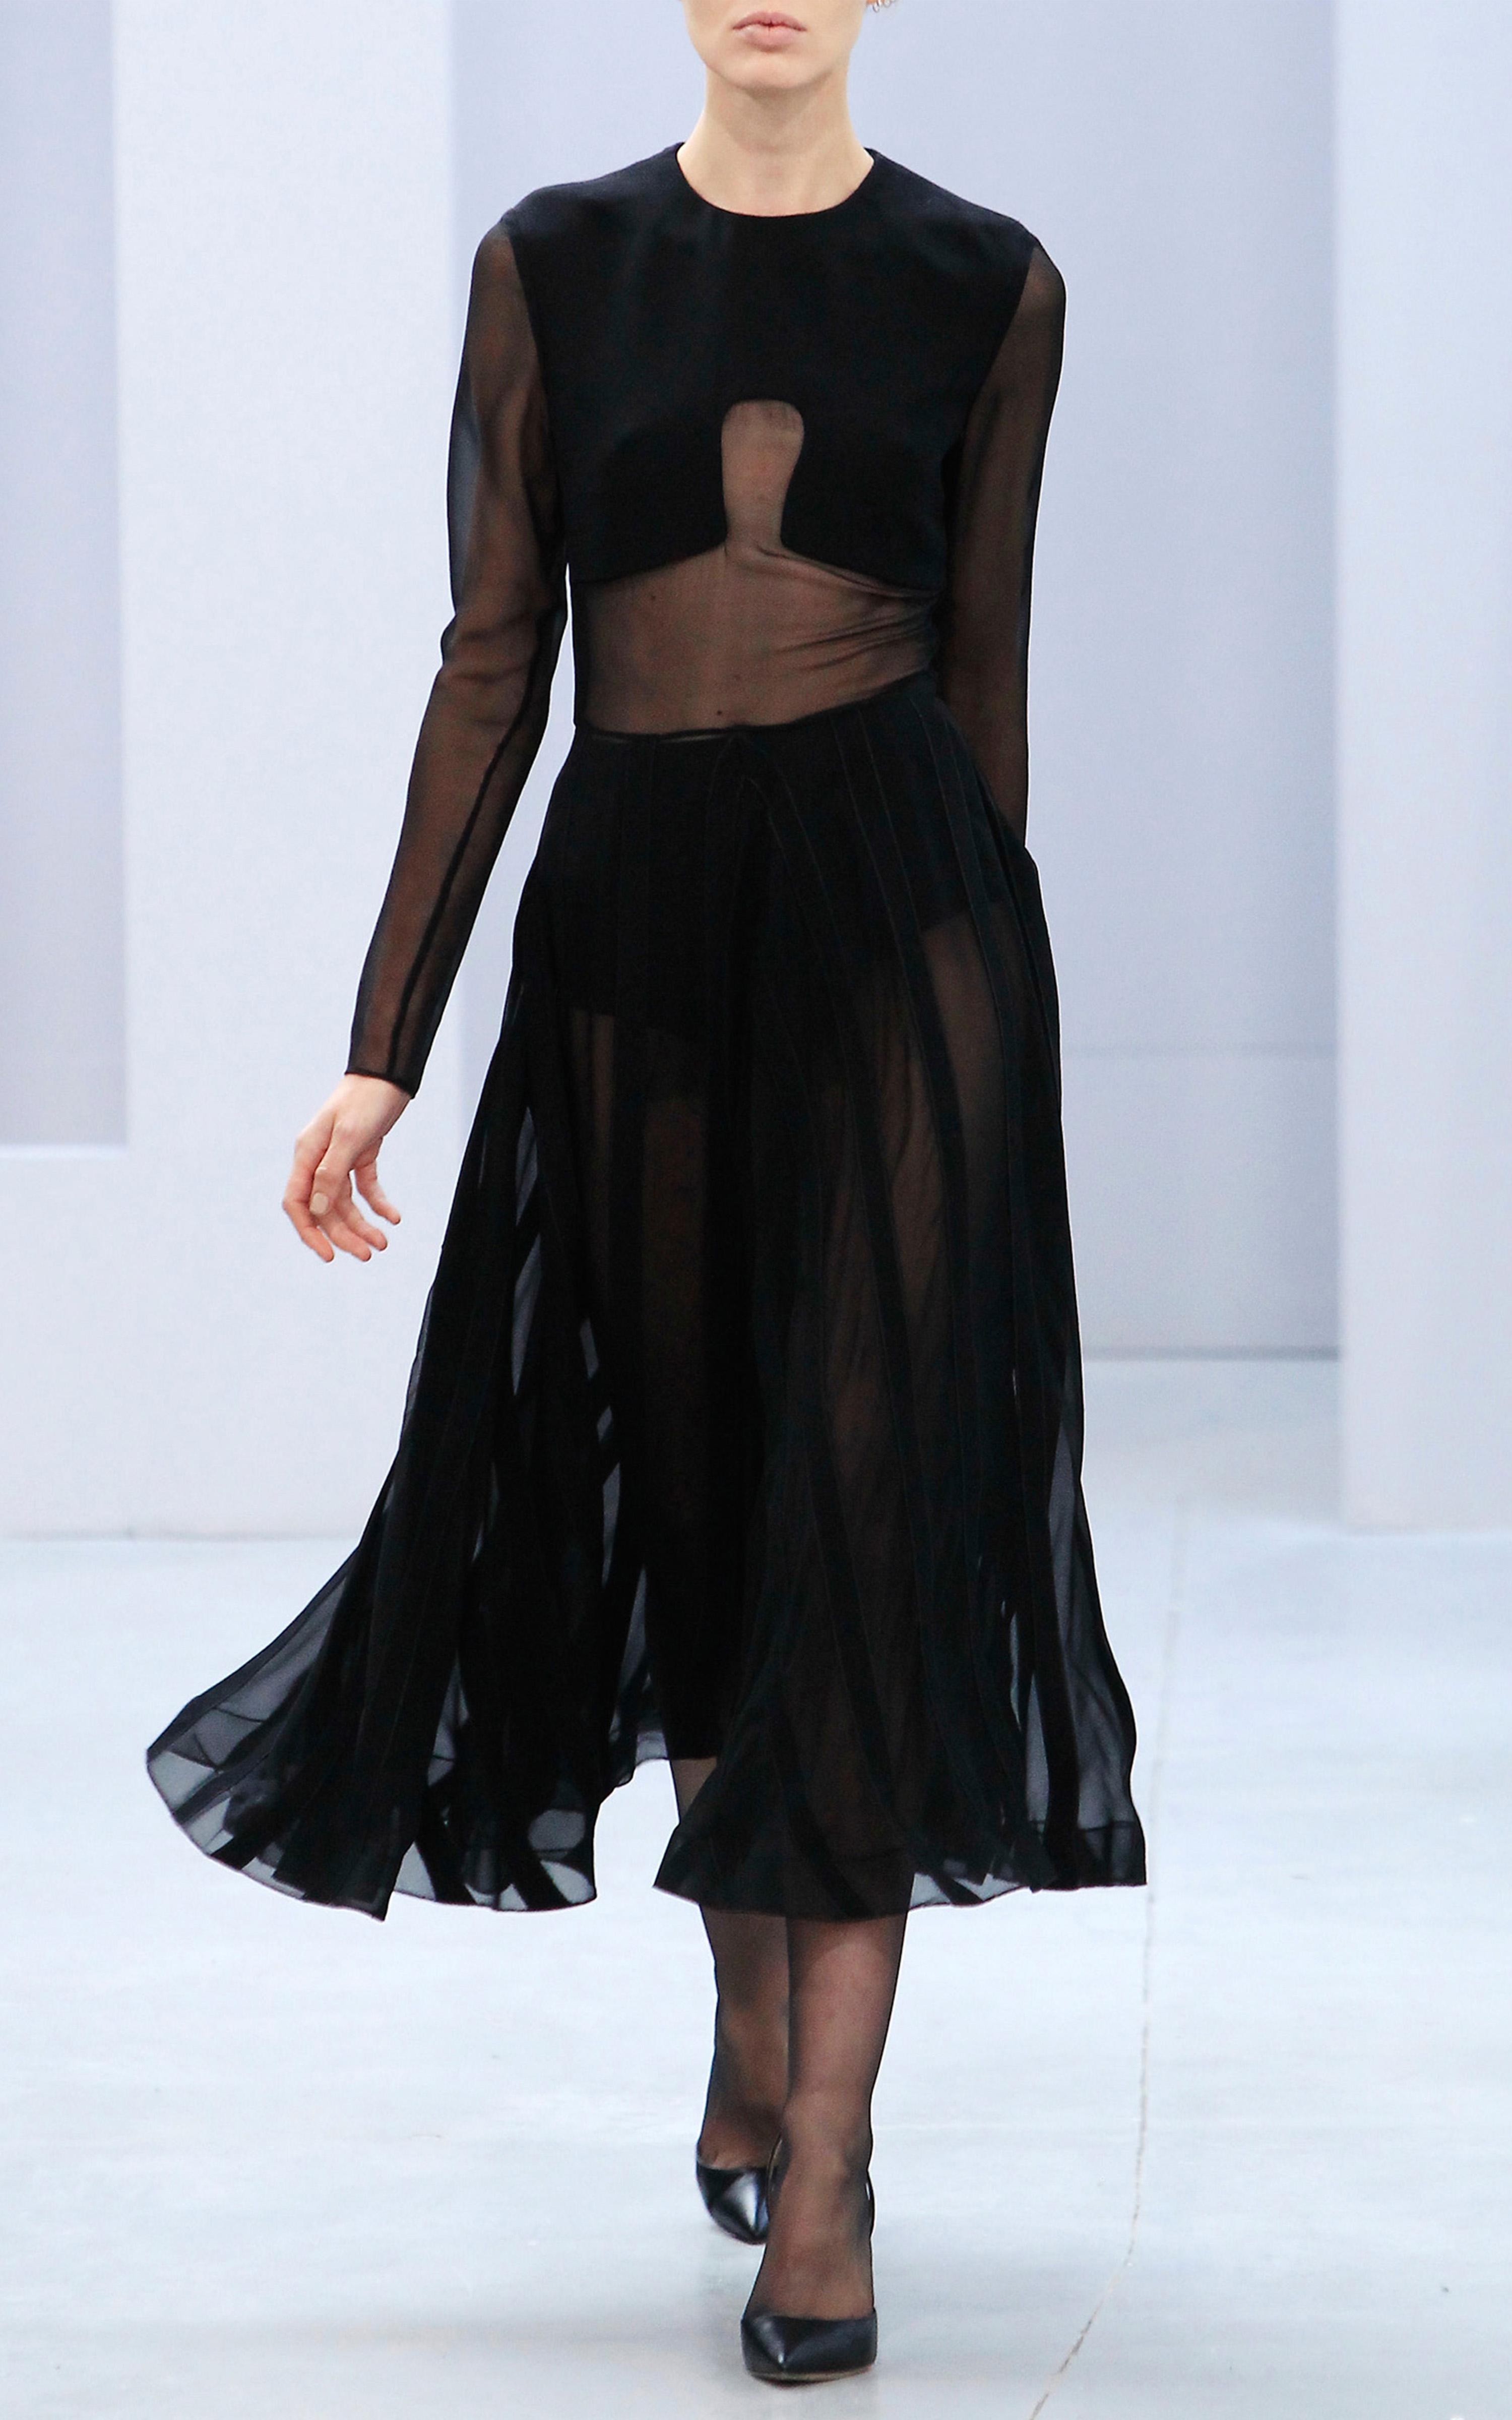 Lyst Barbara Casasola Black Silk Dress In Black